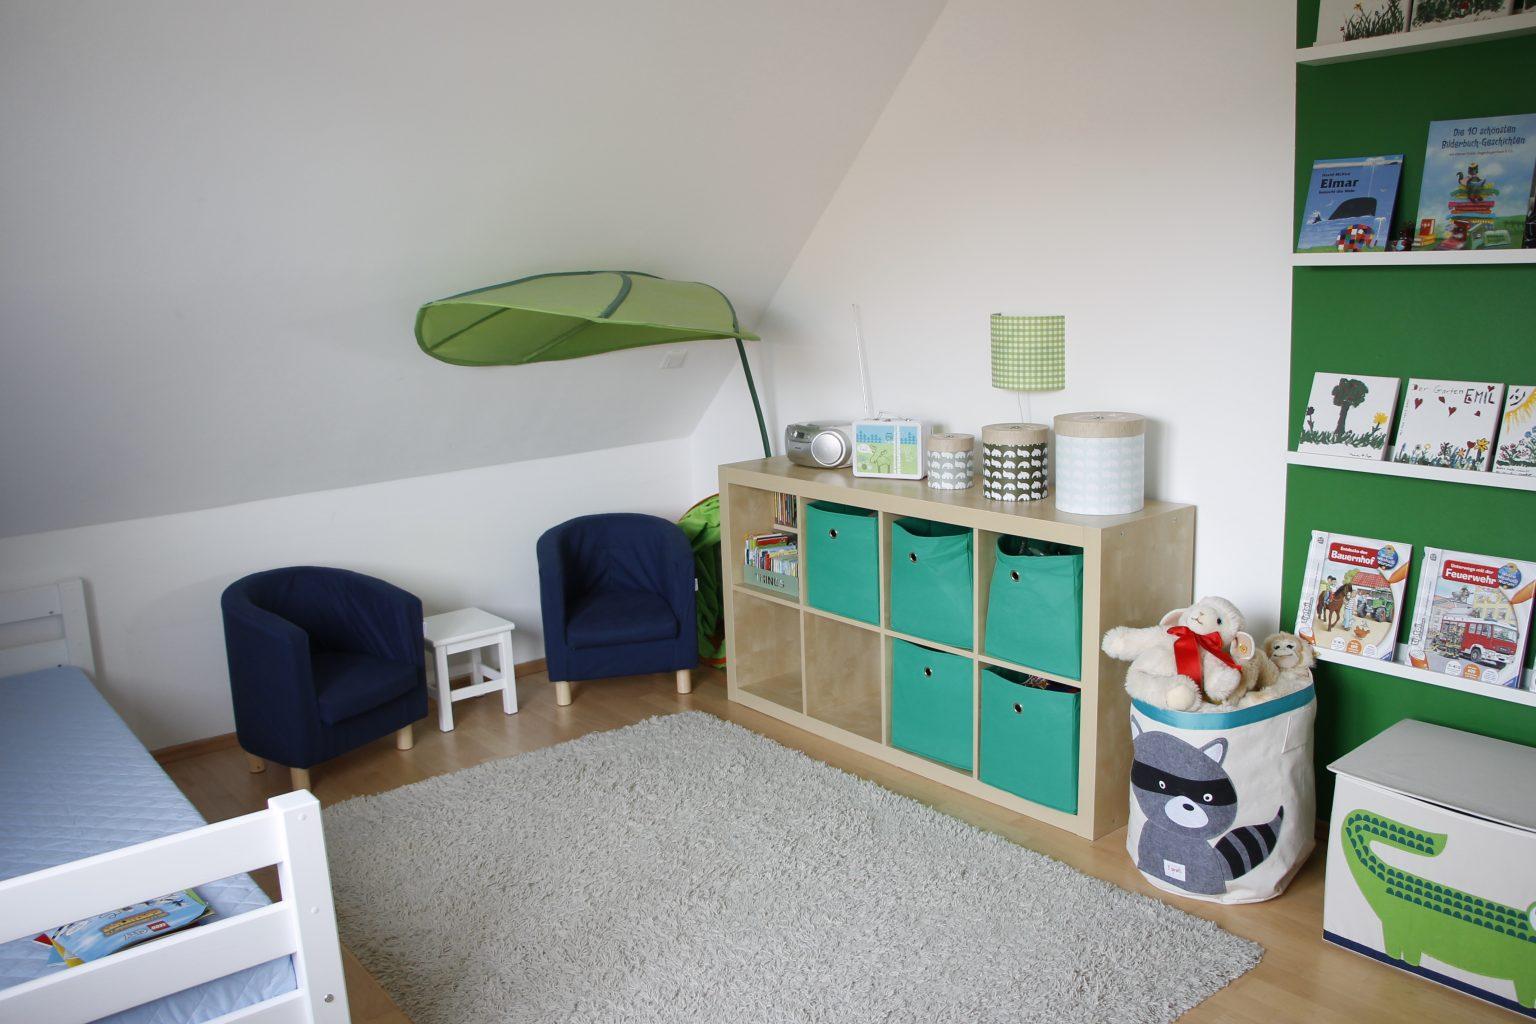 Kinderzimmer-Roomtour